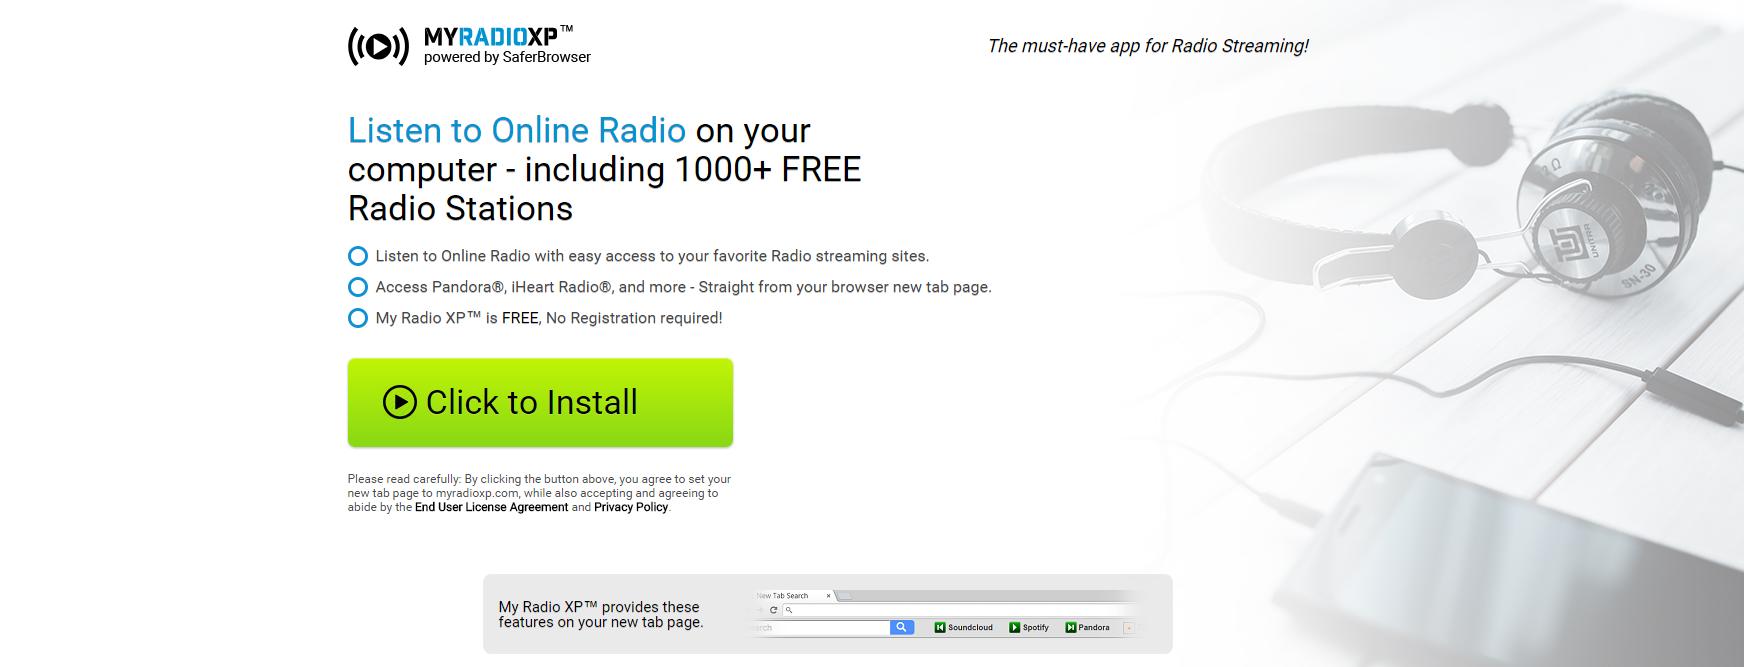 ads by My Radio XP